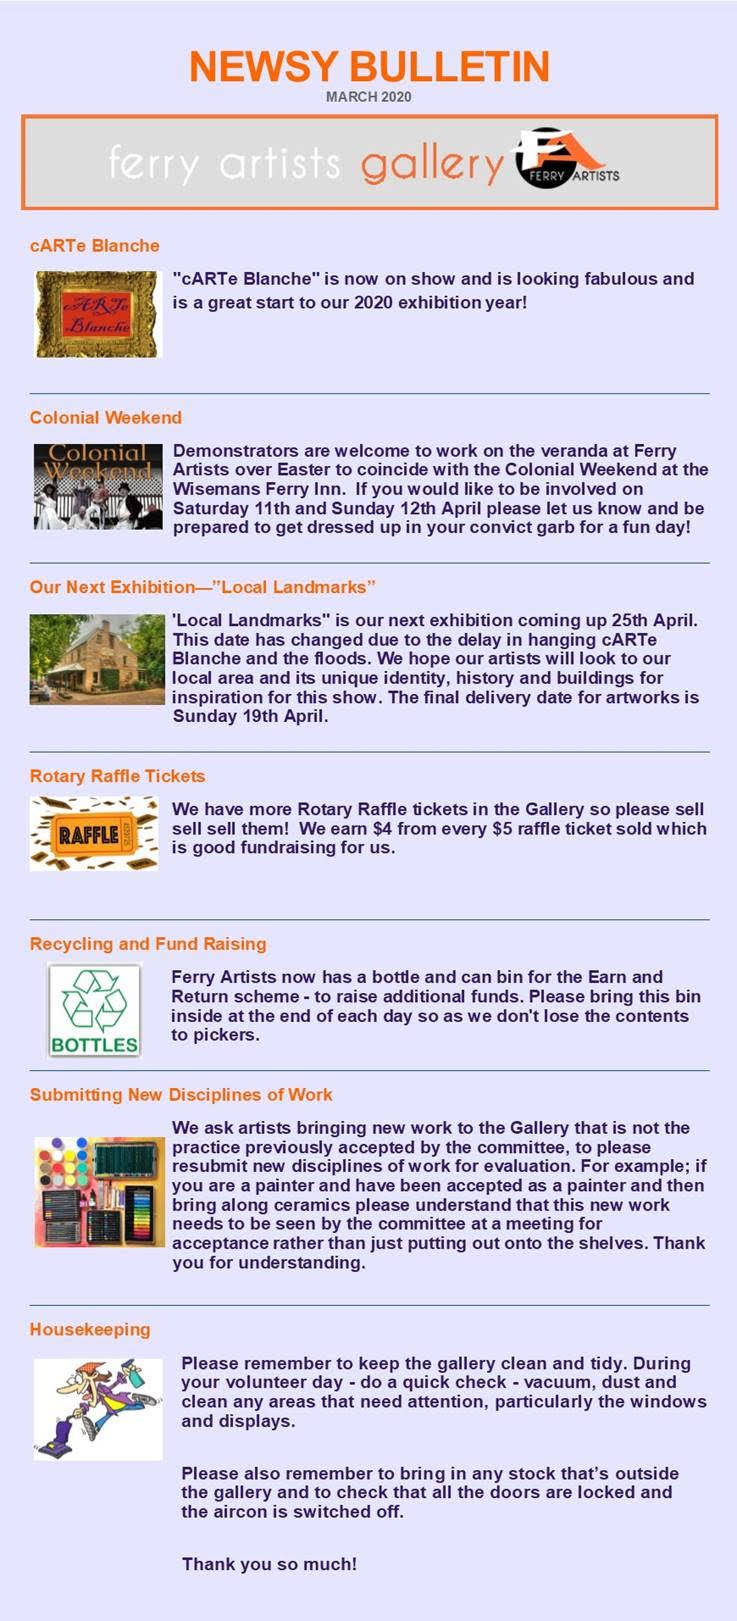 News Bulletin March 2020